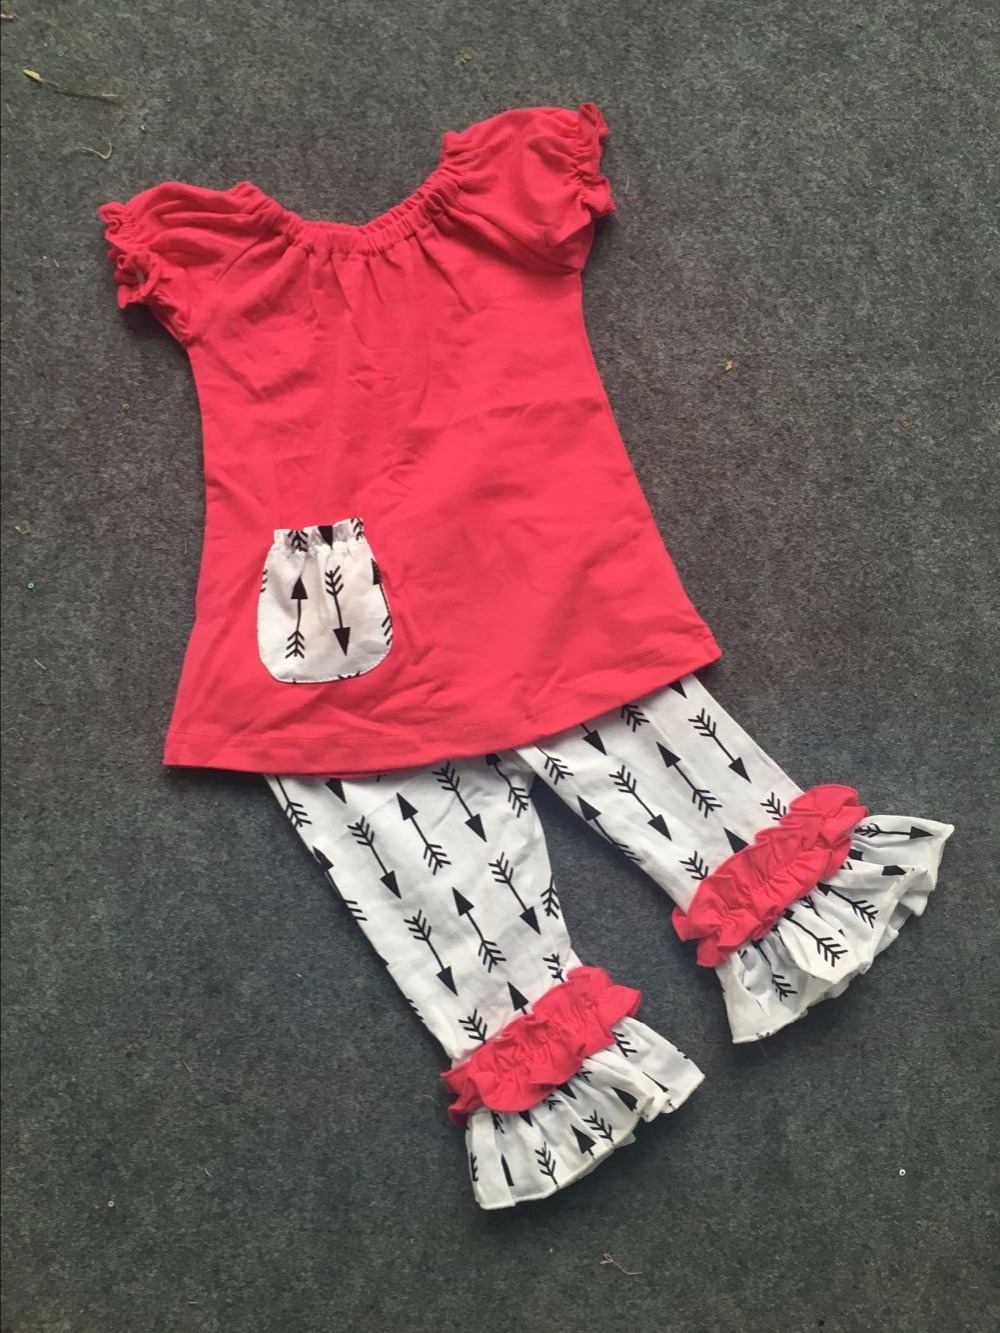 Shirt design for baby girl - Aliexpress Com Buy 2016 New Baby Kids Summer Design Hot Pink Shirt Girls Boutique Clothing Arrow Capri Set Girls Cute Outfits Set From Reliable Set Girl